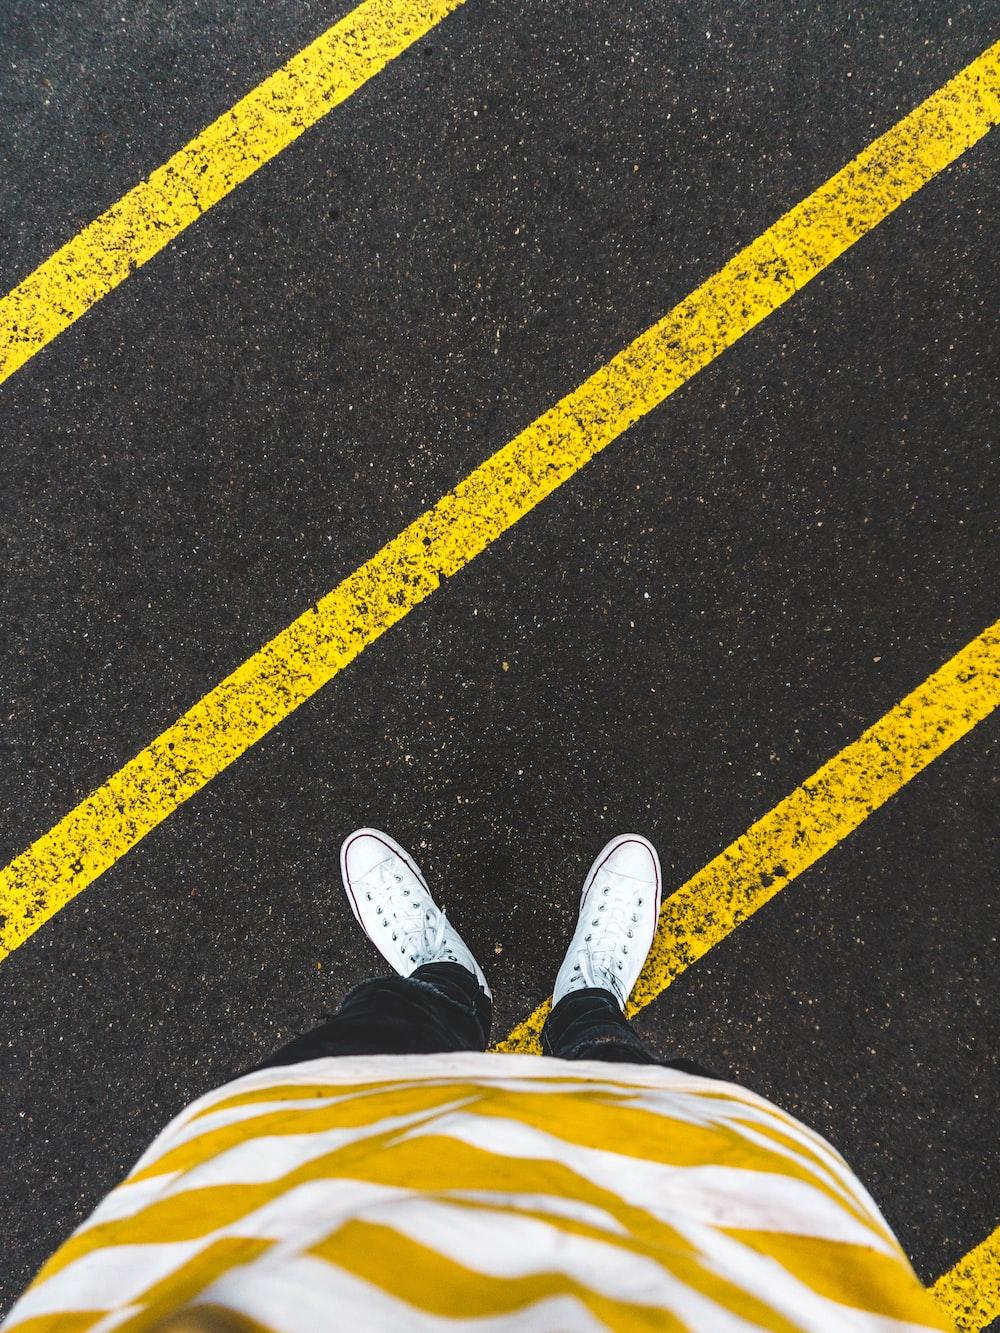 person standing on pedestrian lane